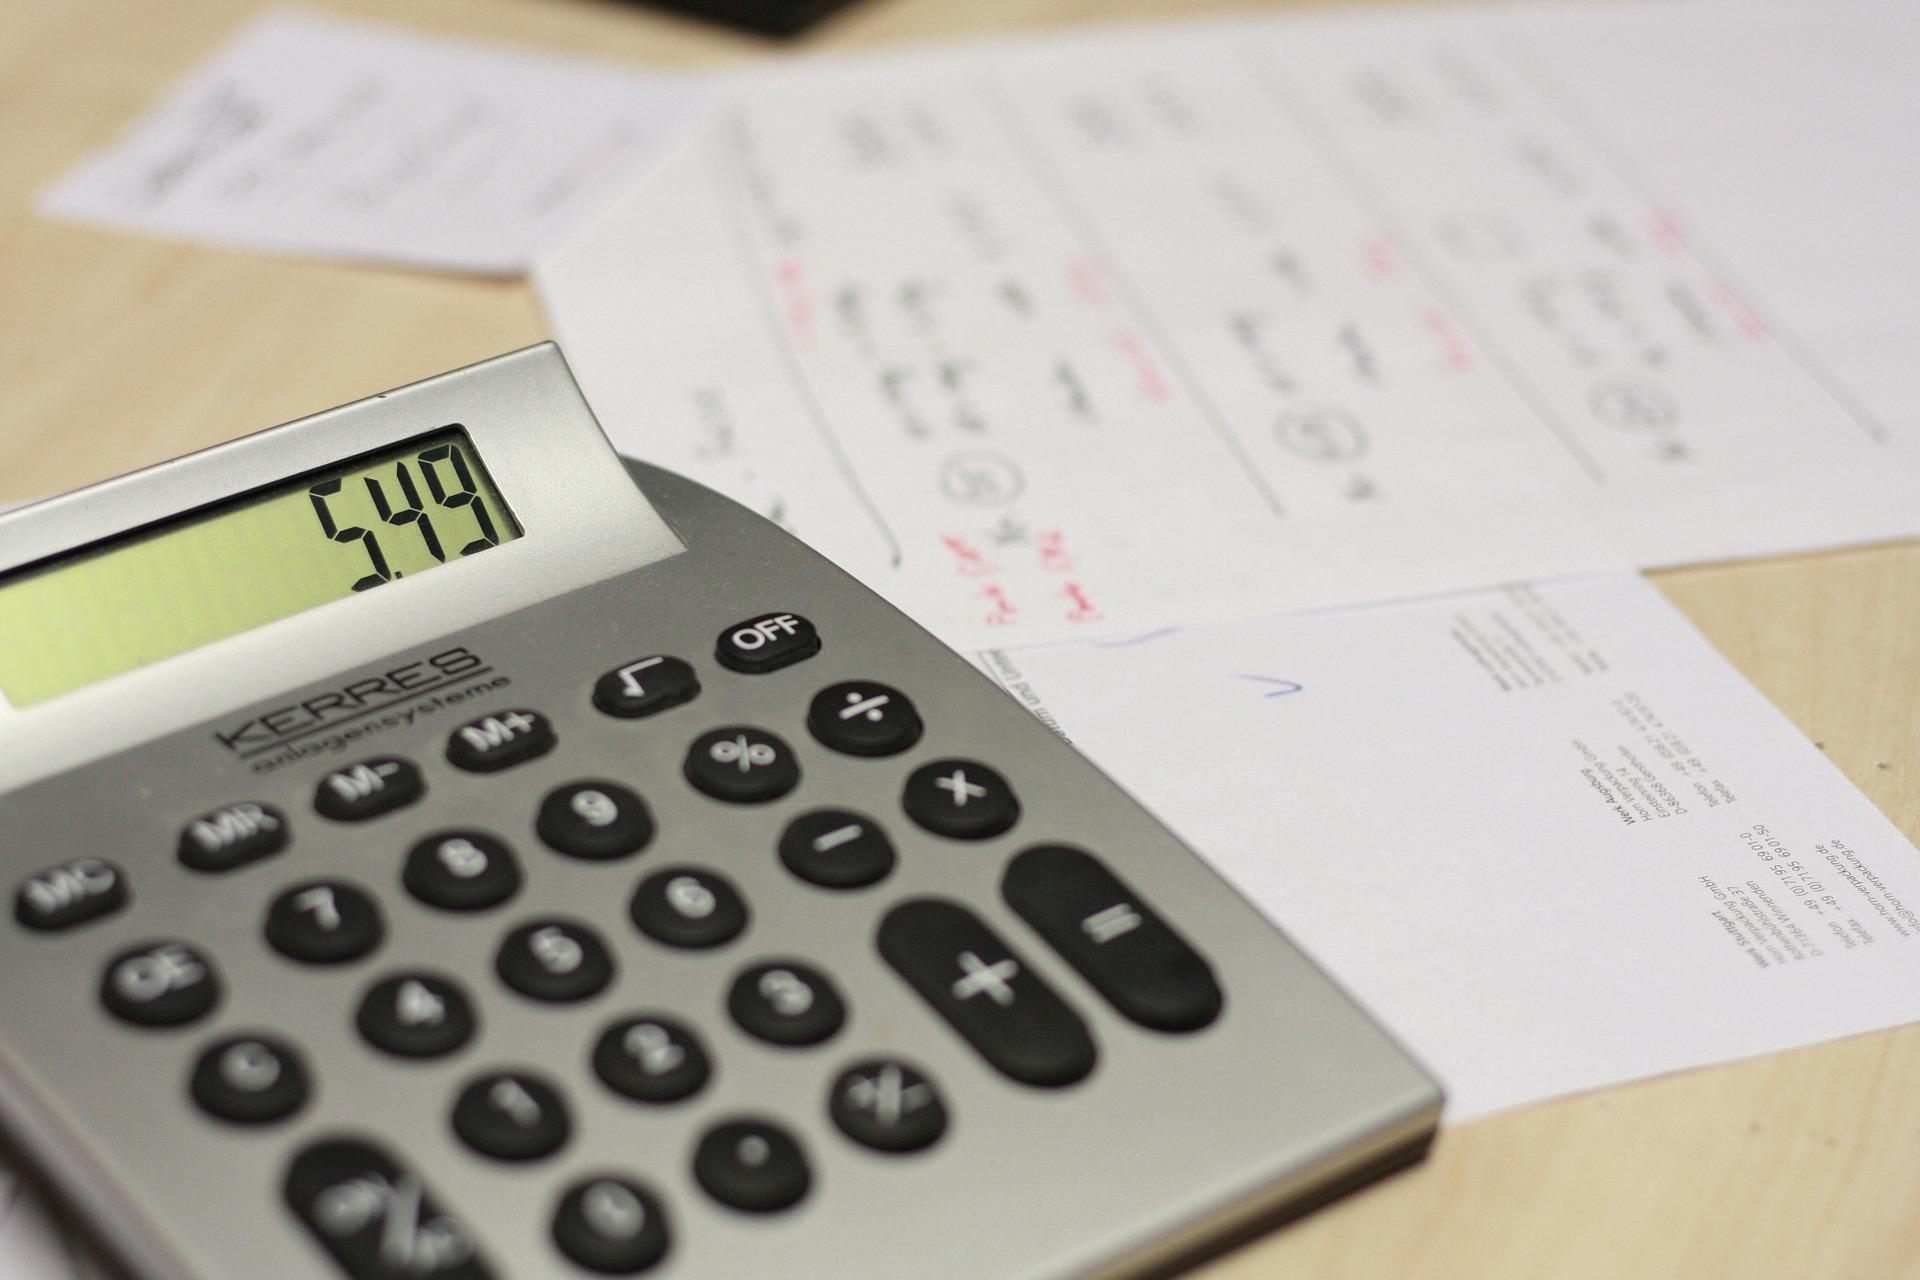 Calculator 1156121 1920